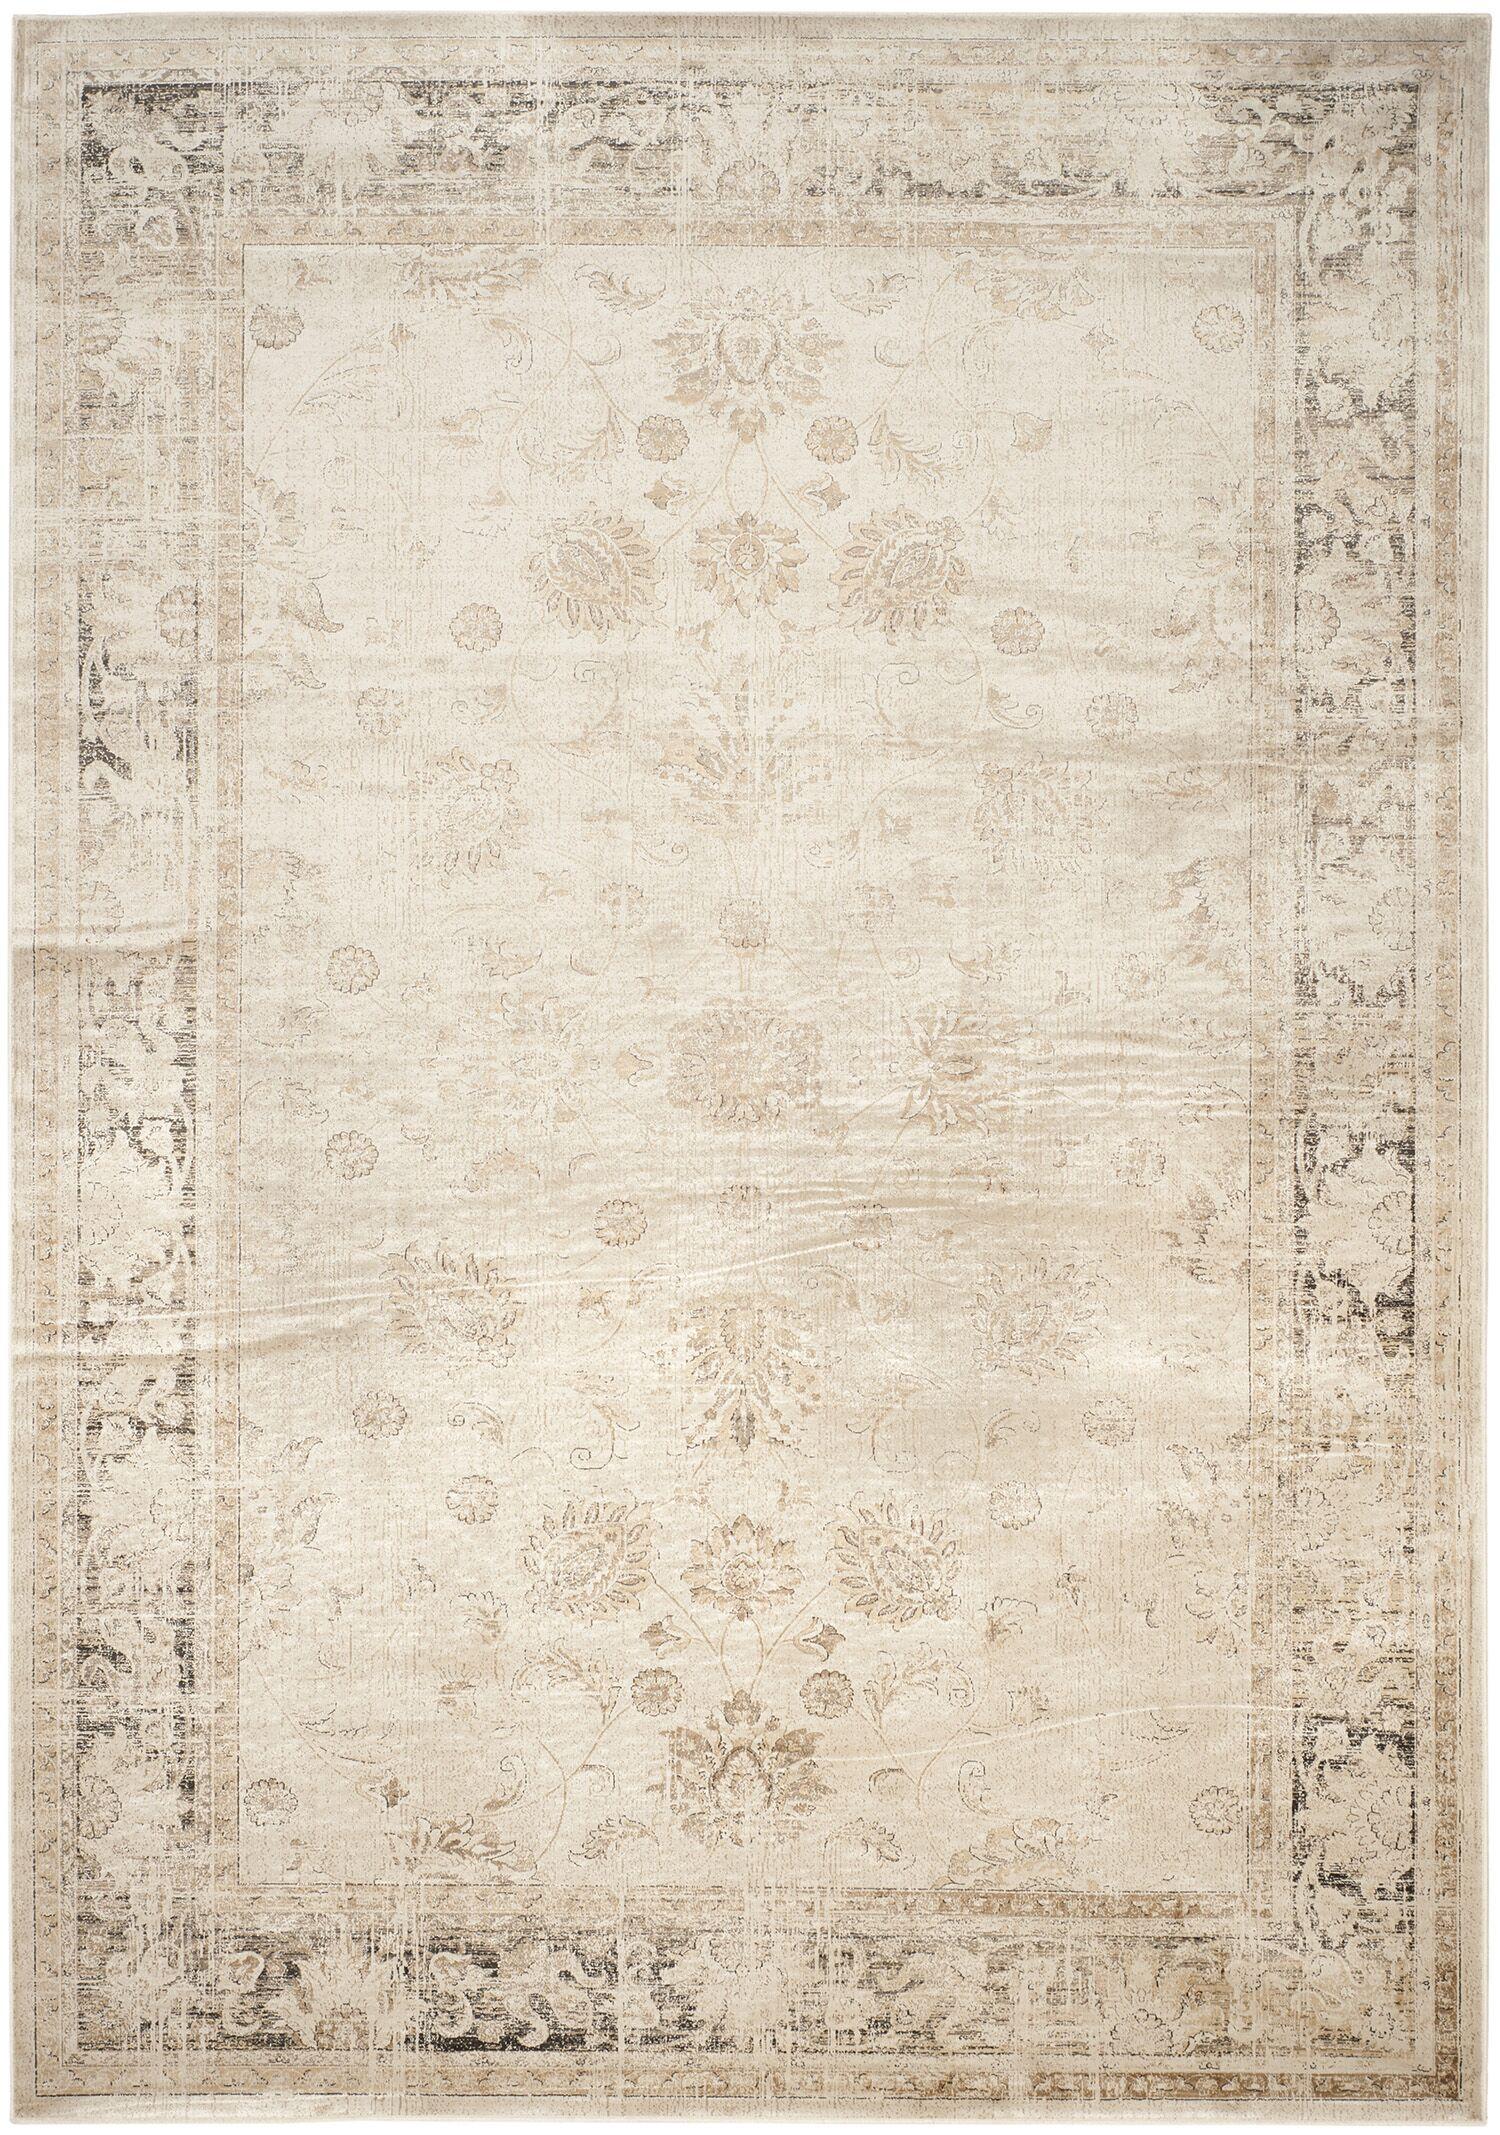 Gillmore Stone Area Rug Rug Size: Rectangle 8' x 11'2